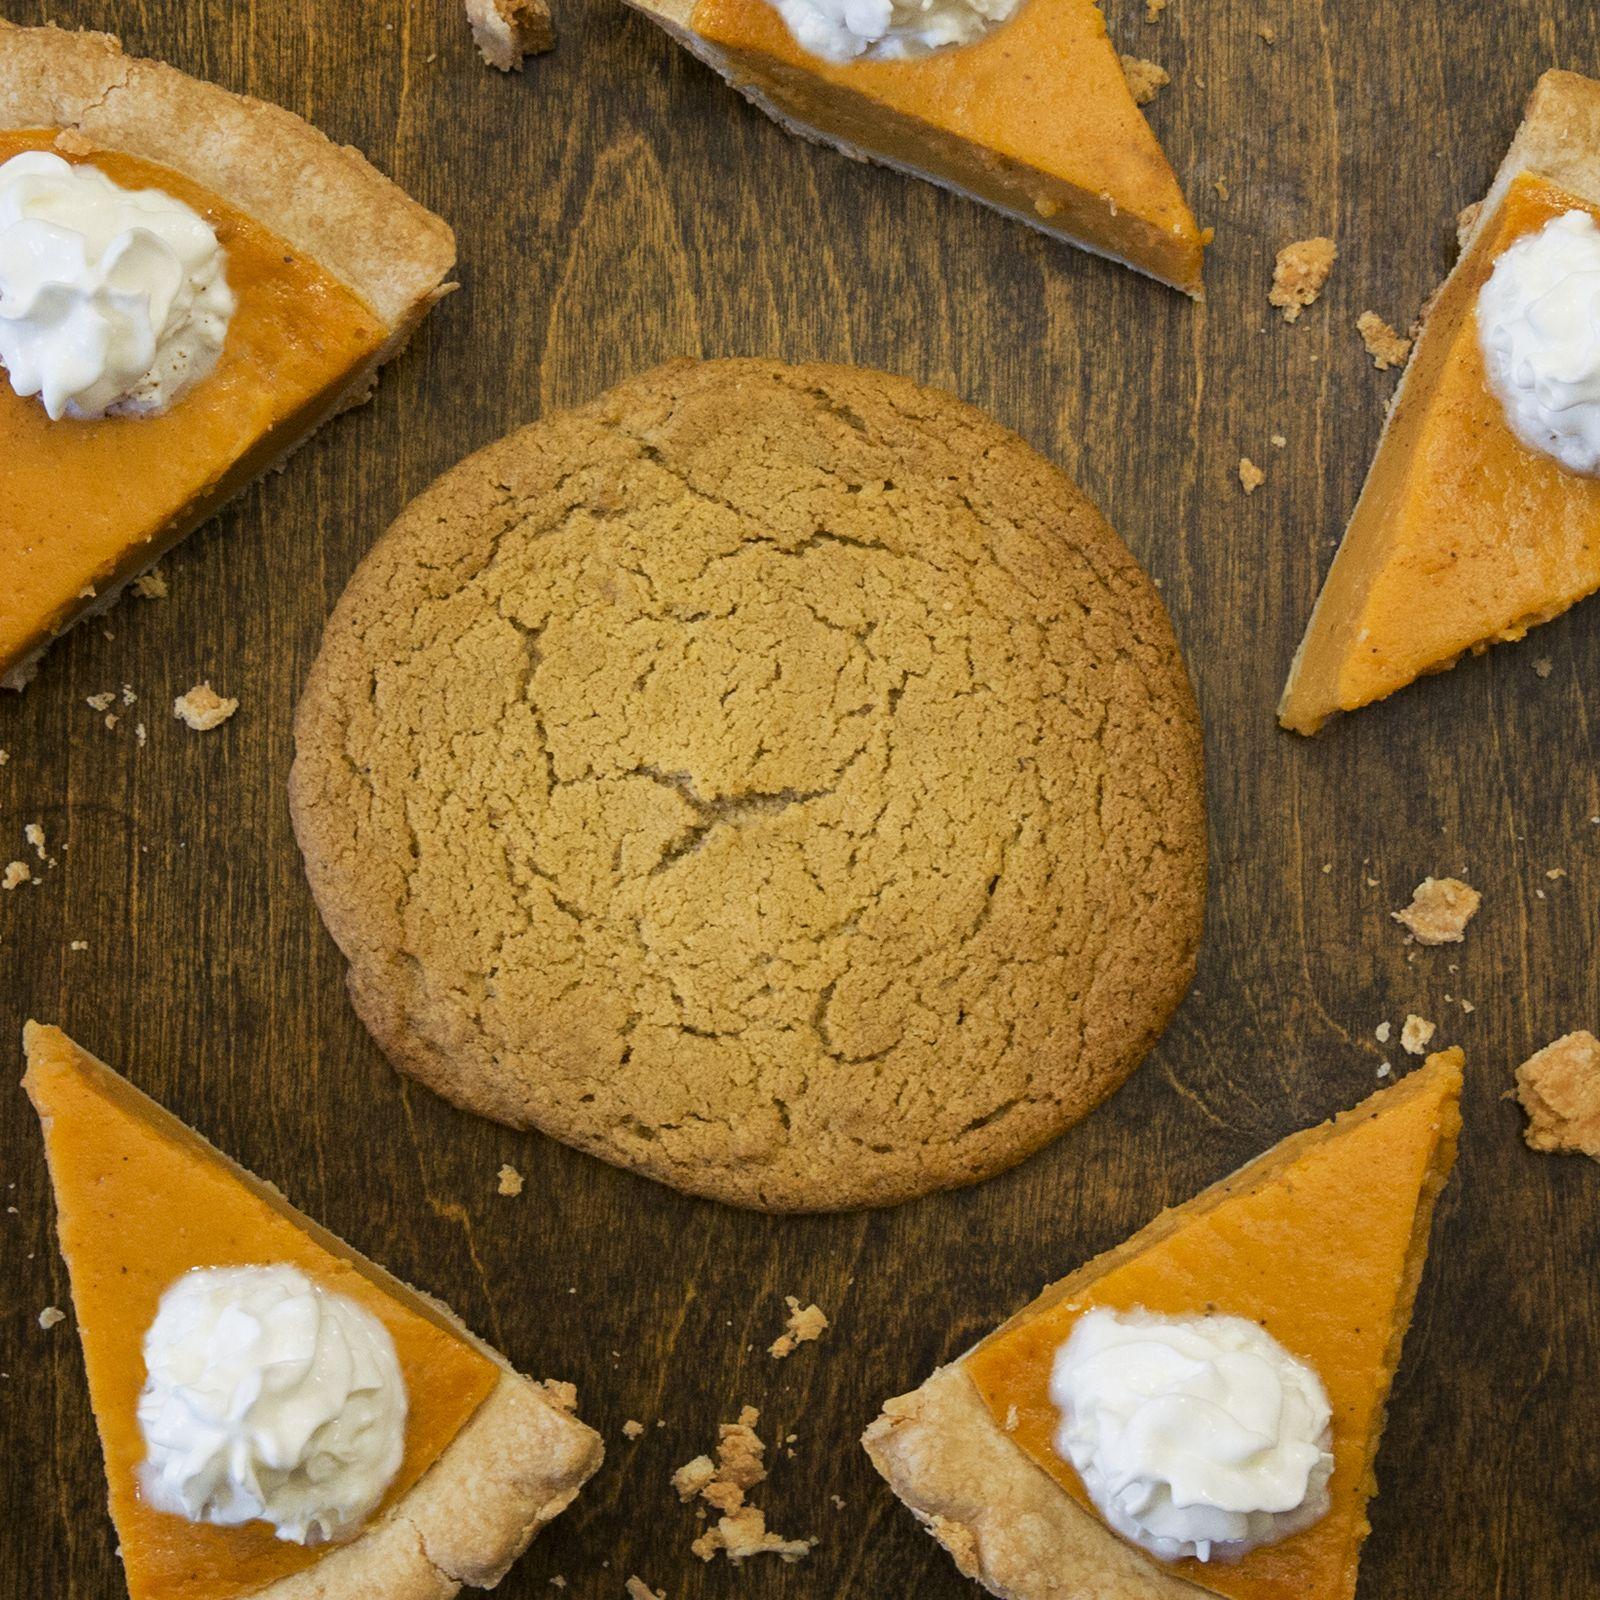 Back by Popular Demand, Potbelly Sandwich Shop Fan-Favorite Pastrami Sandwich Returns